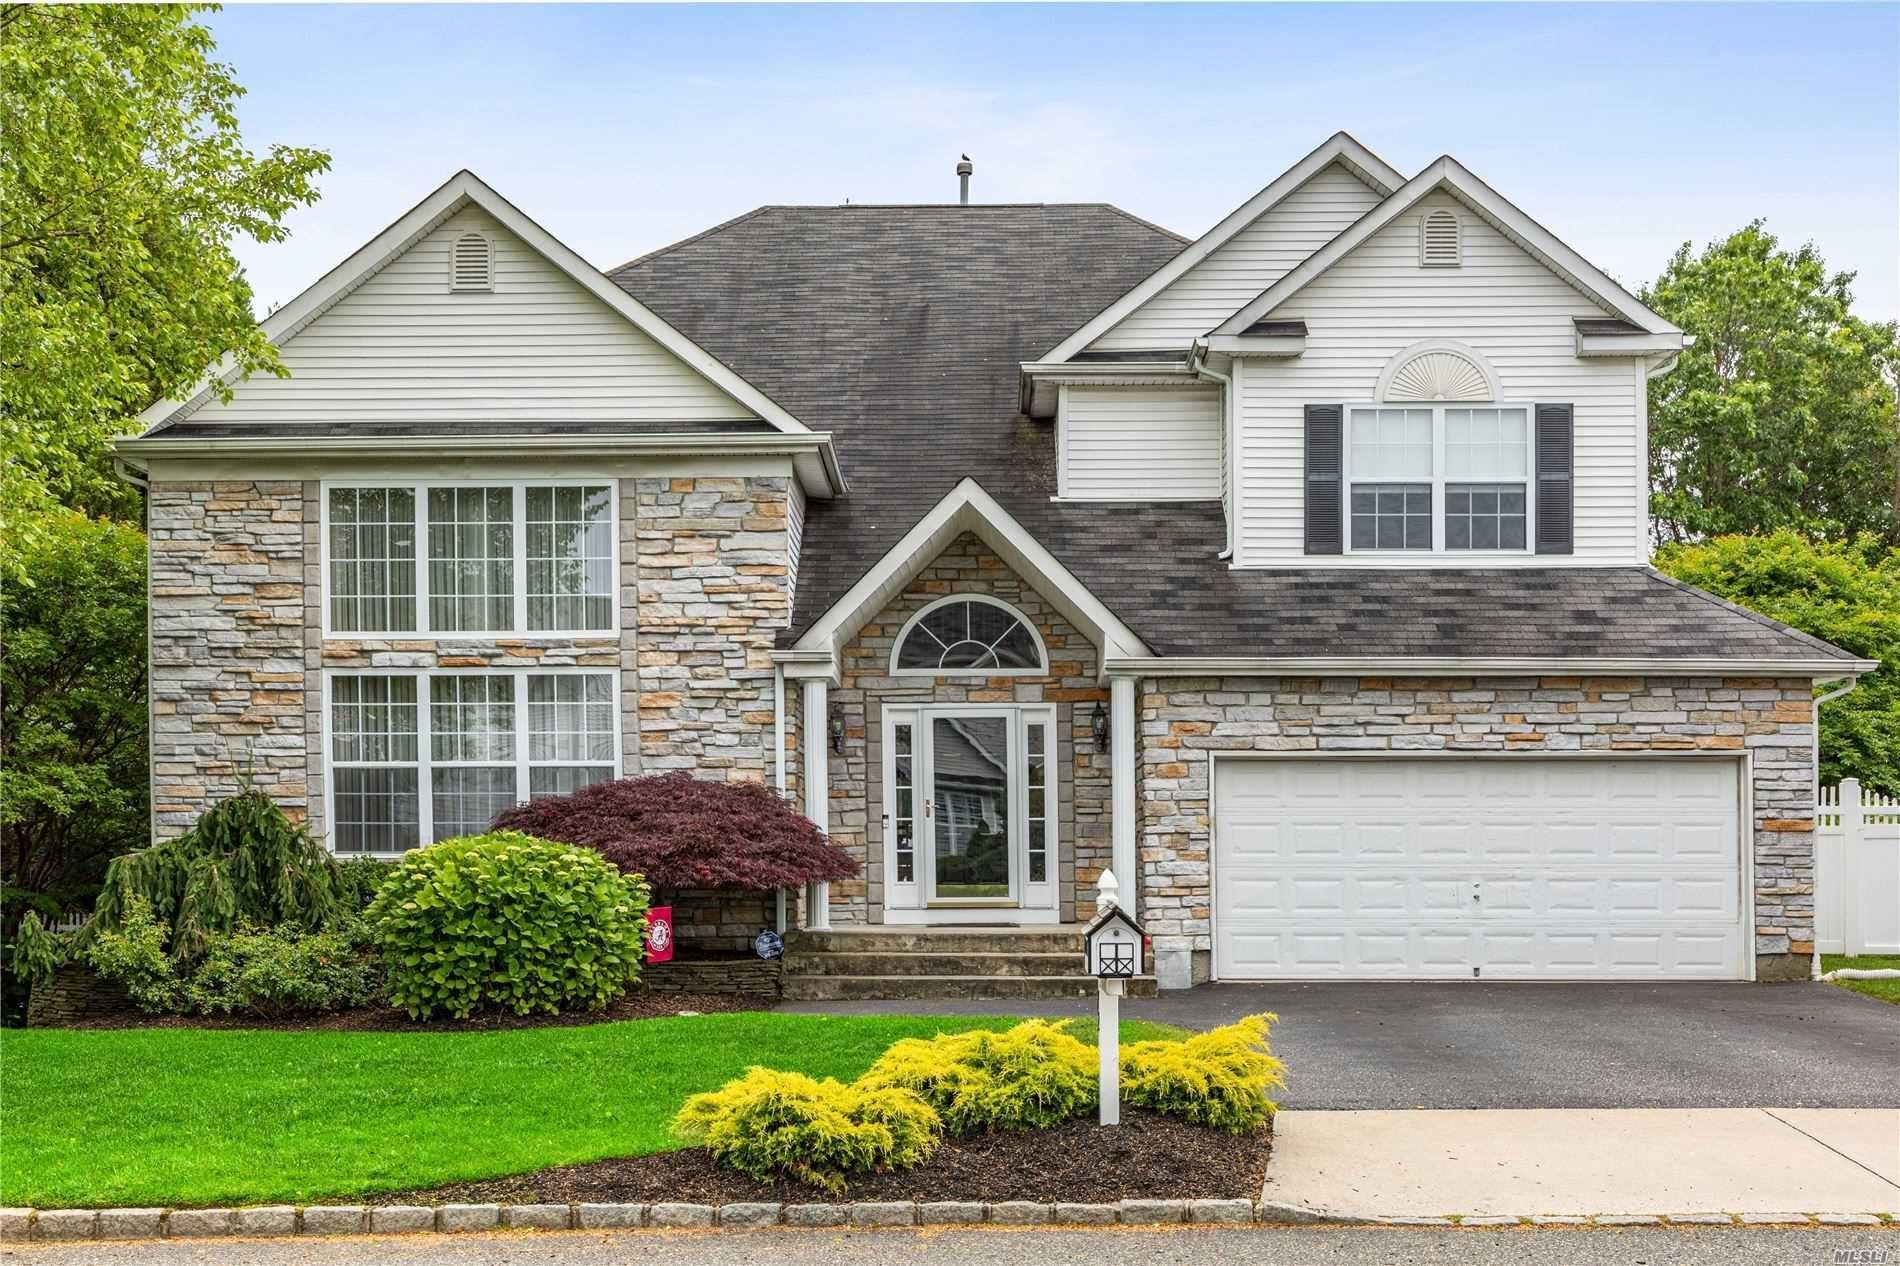 72 Blueberry Ridge Drive, Holtsville, NY 11742 - MLS#: 3223781